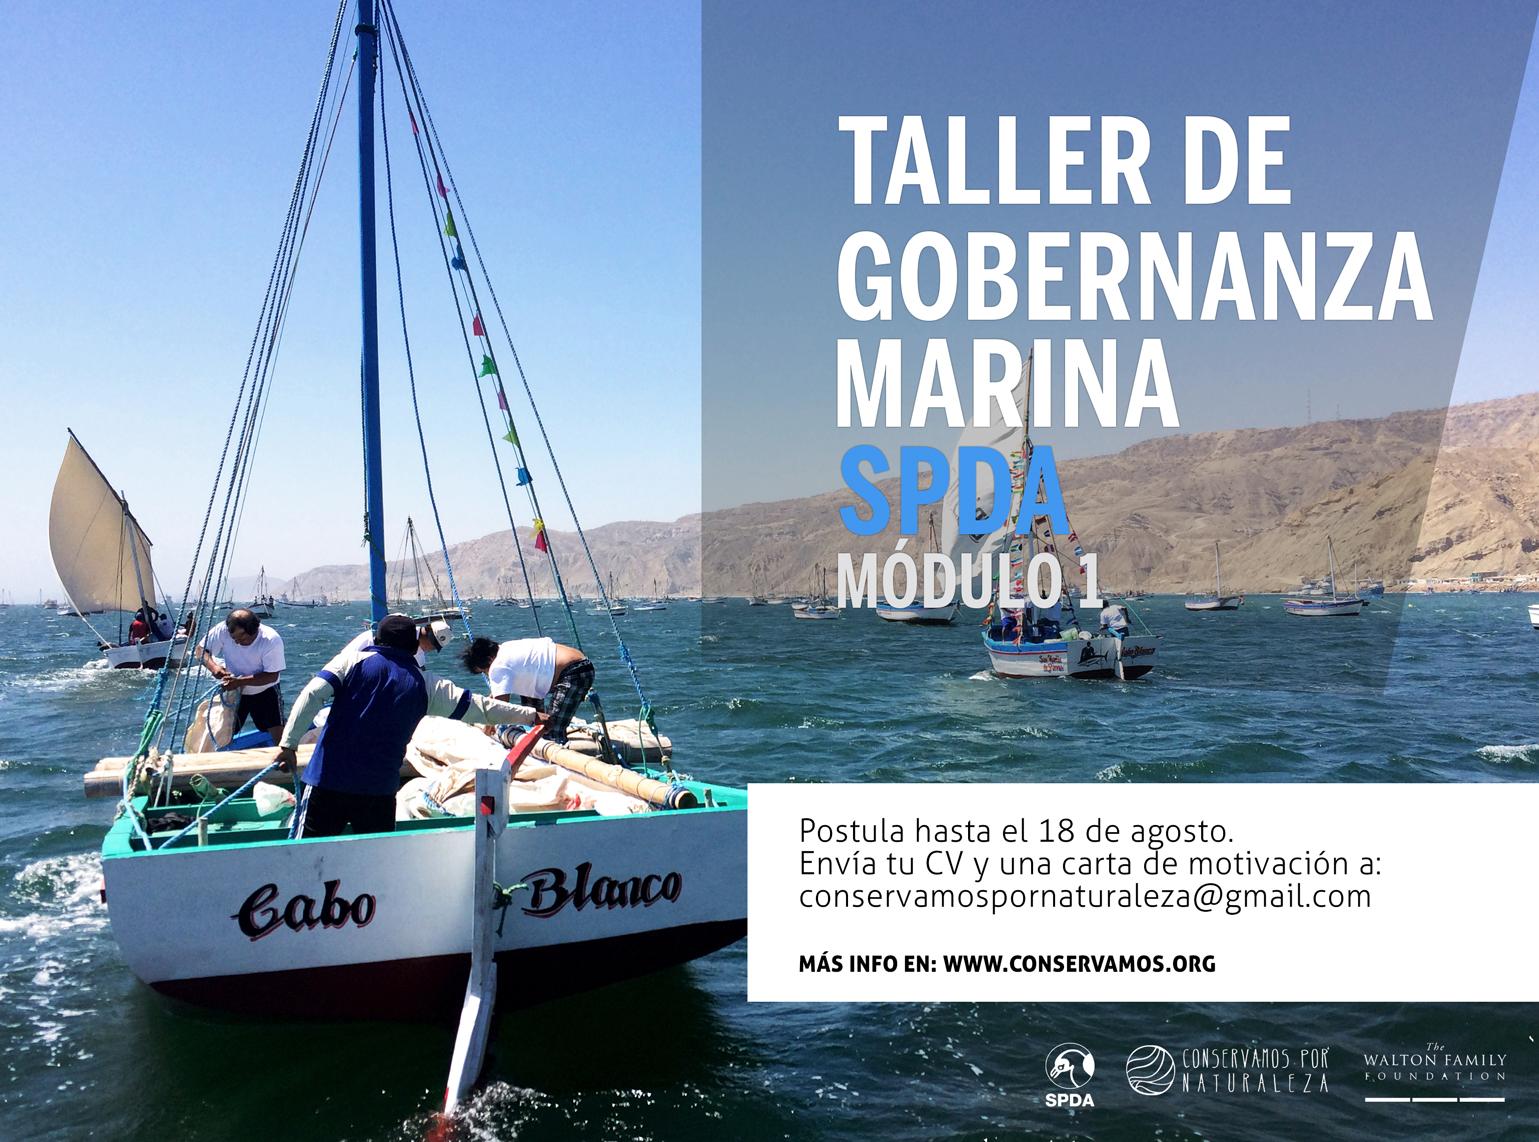 taller-gobernanza-mar